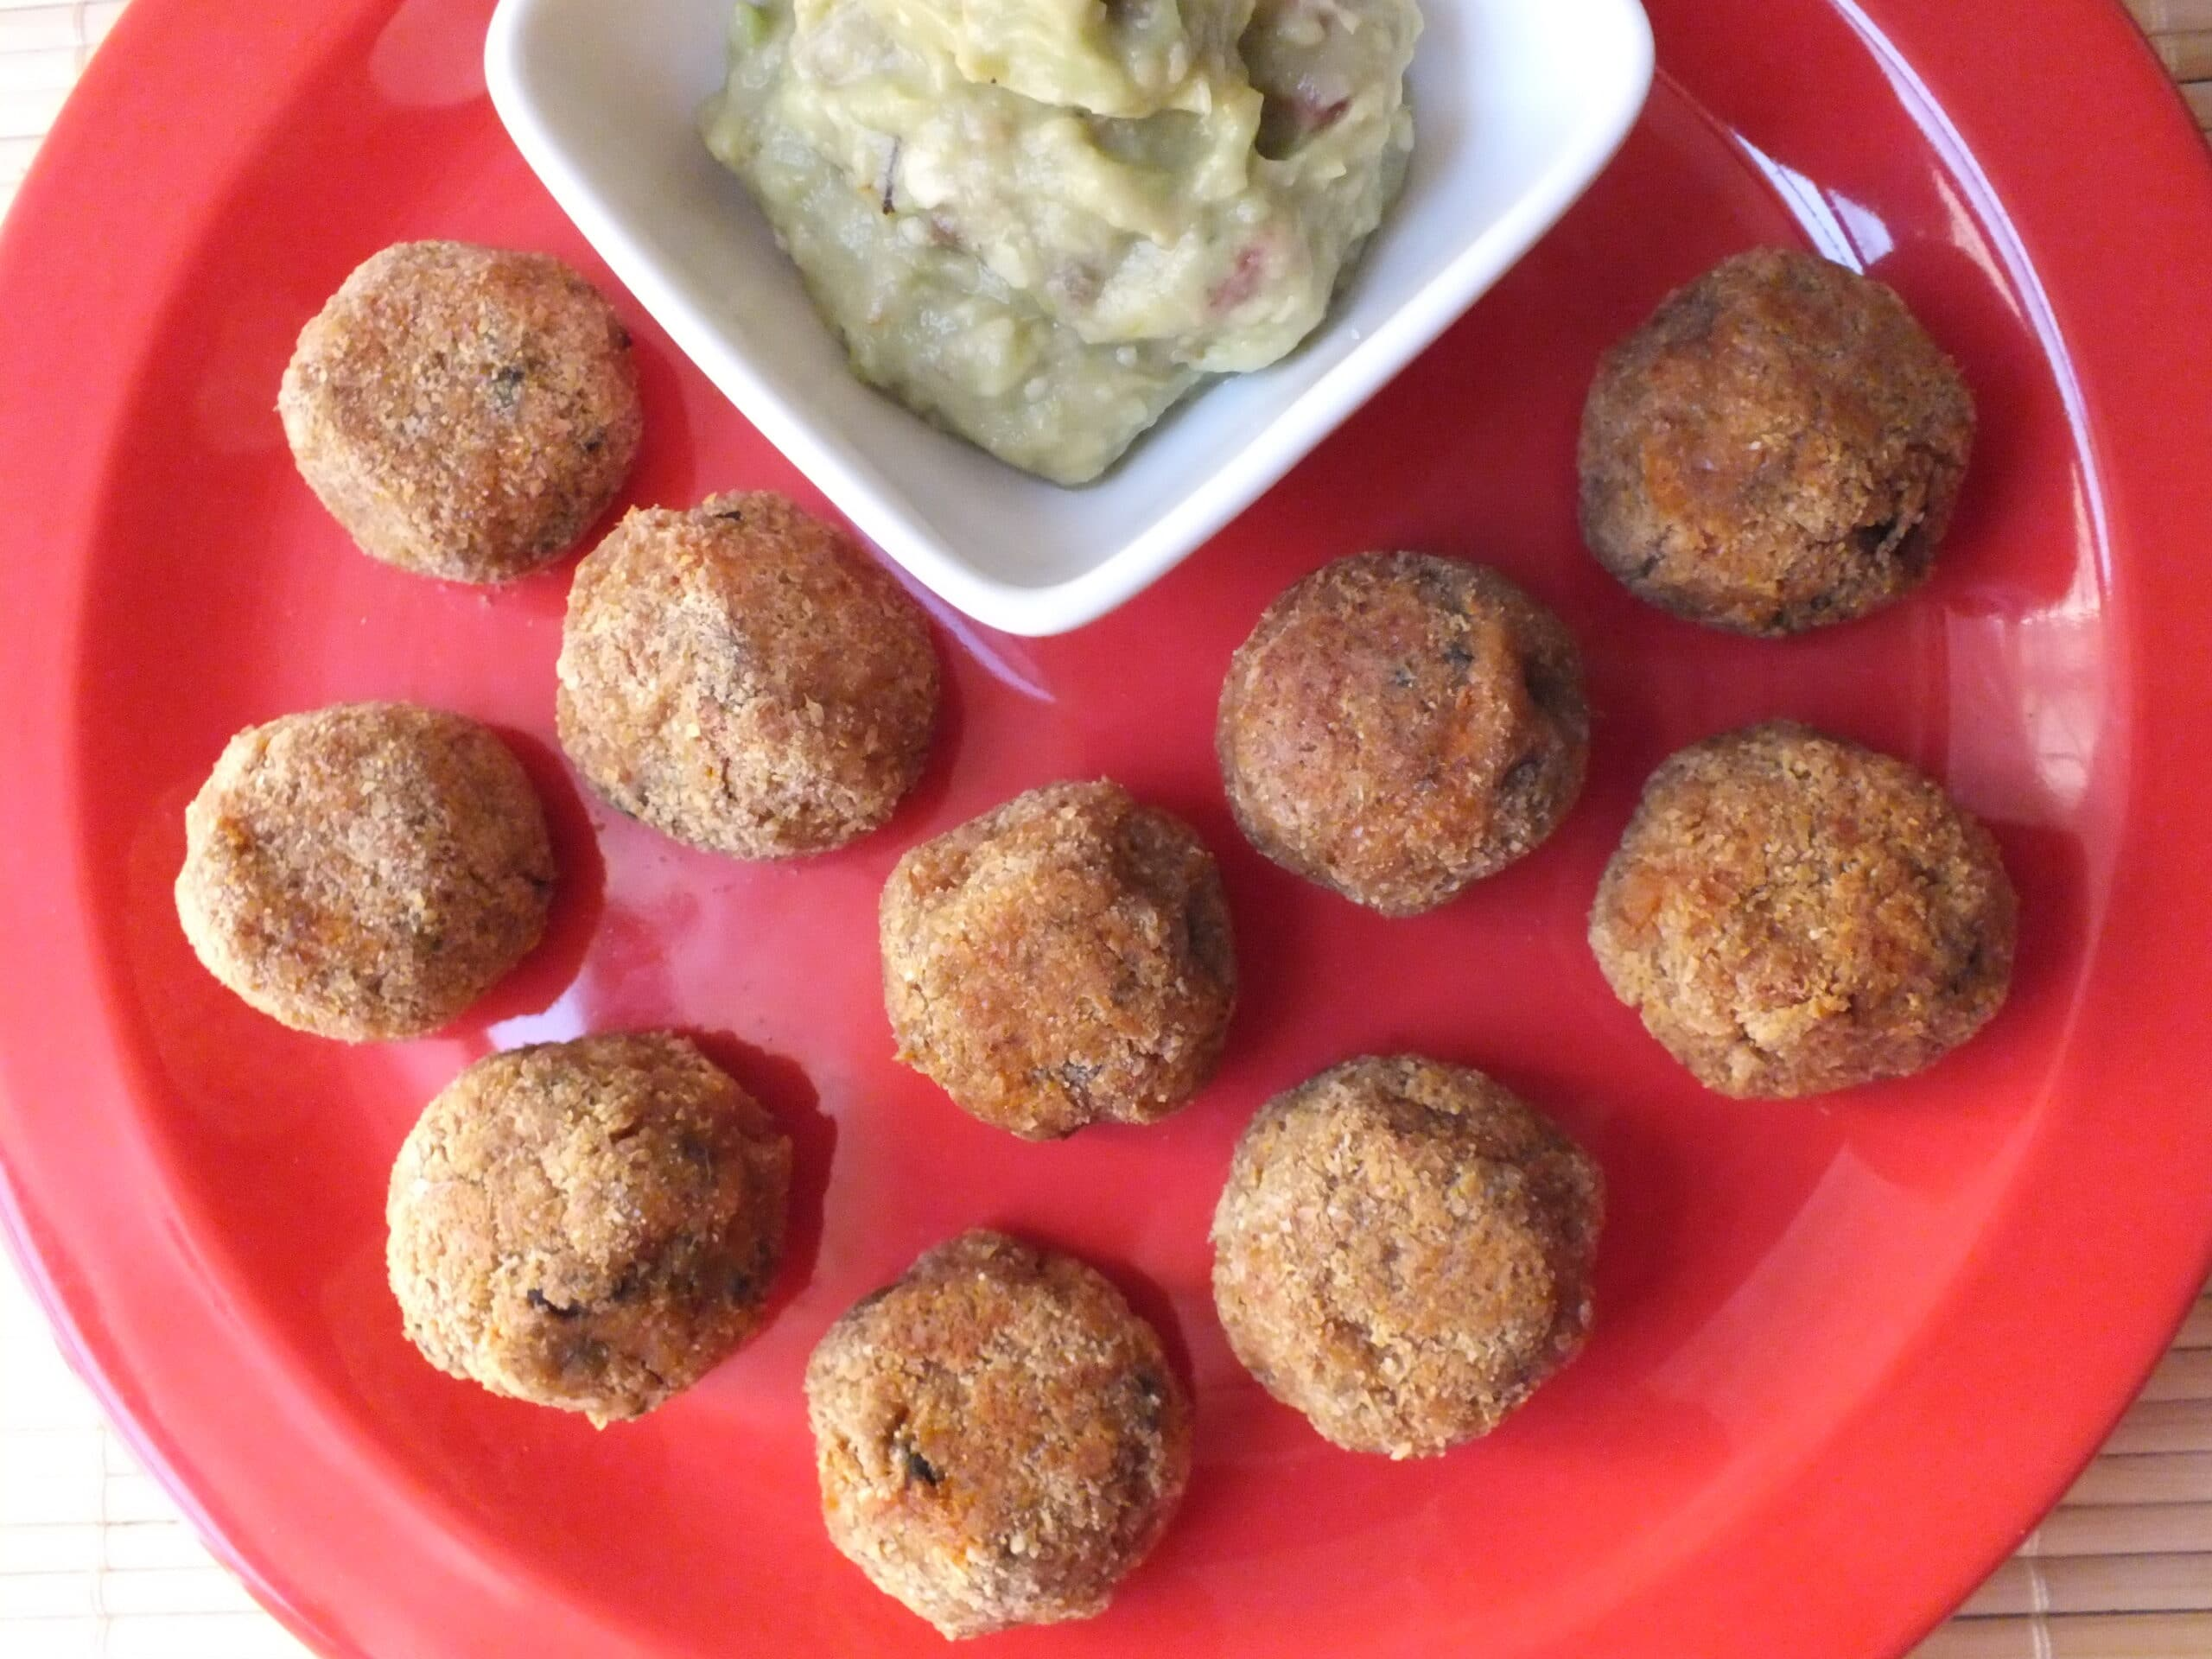 Spicy Sweet Potato Bites with Avocado Lemon Dip [Vegan, Gluten-Free]